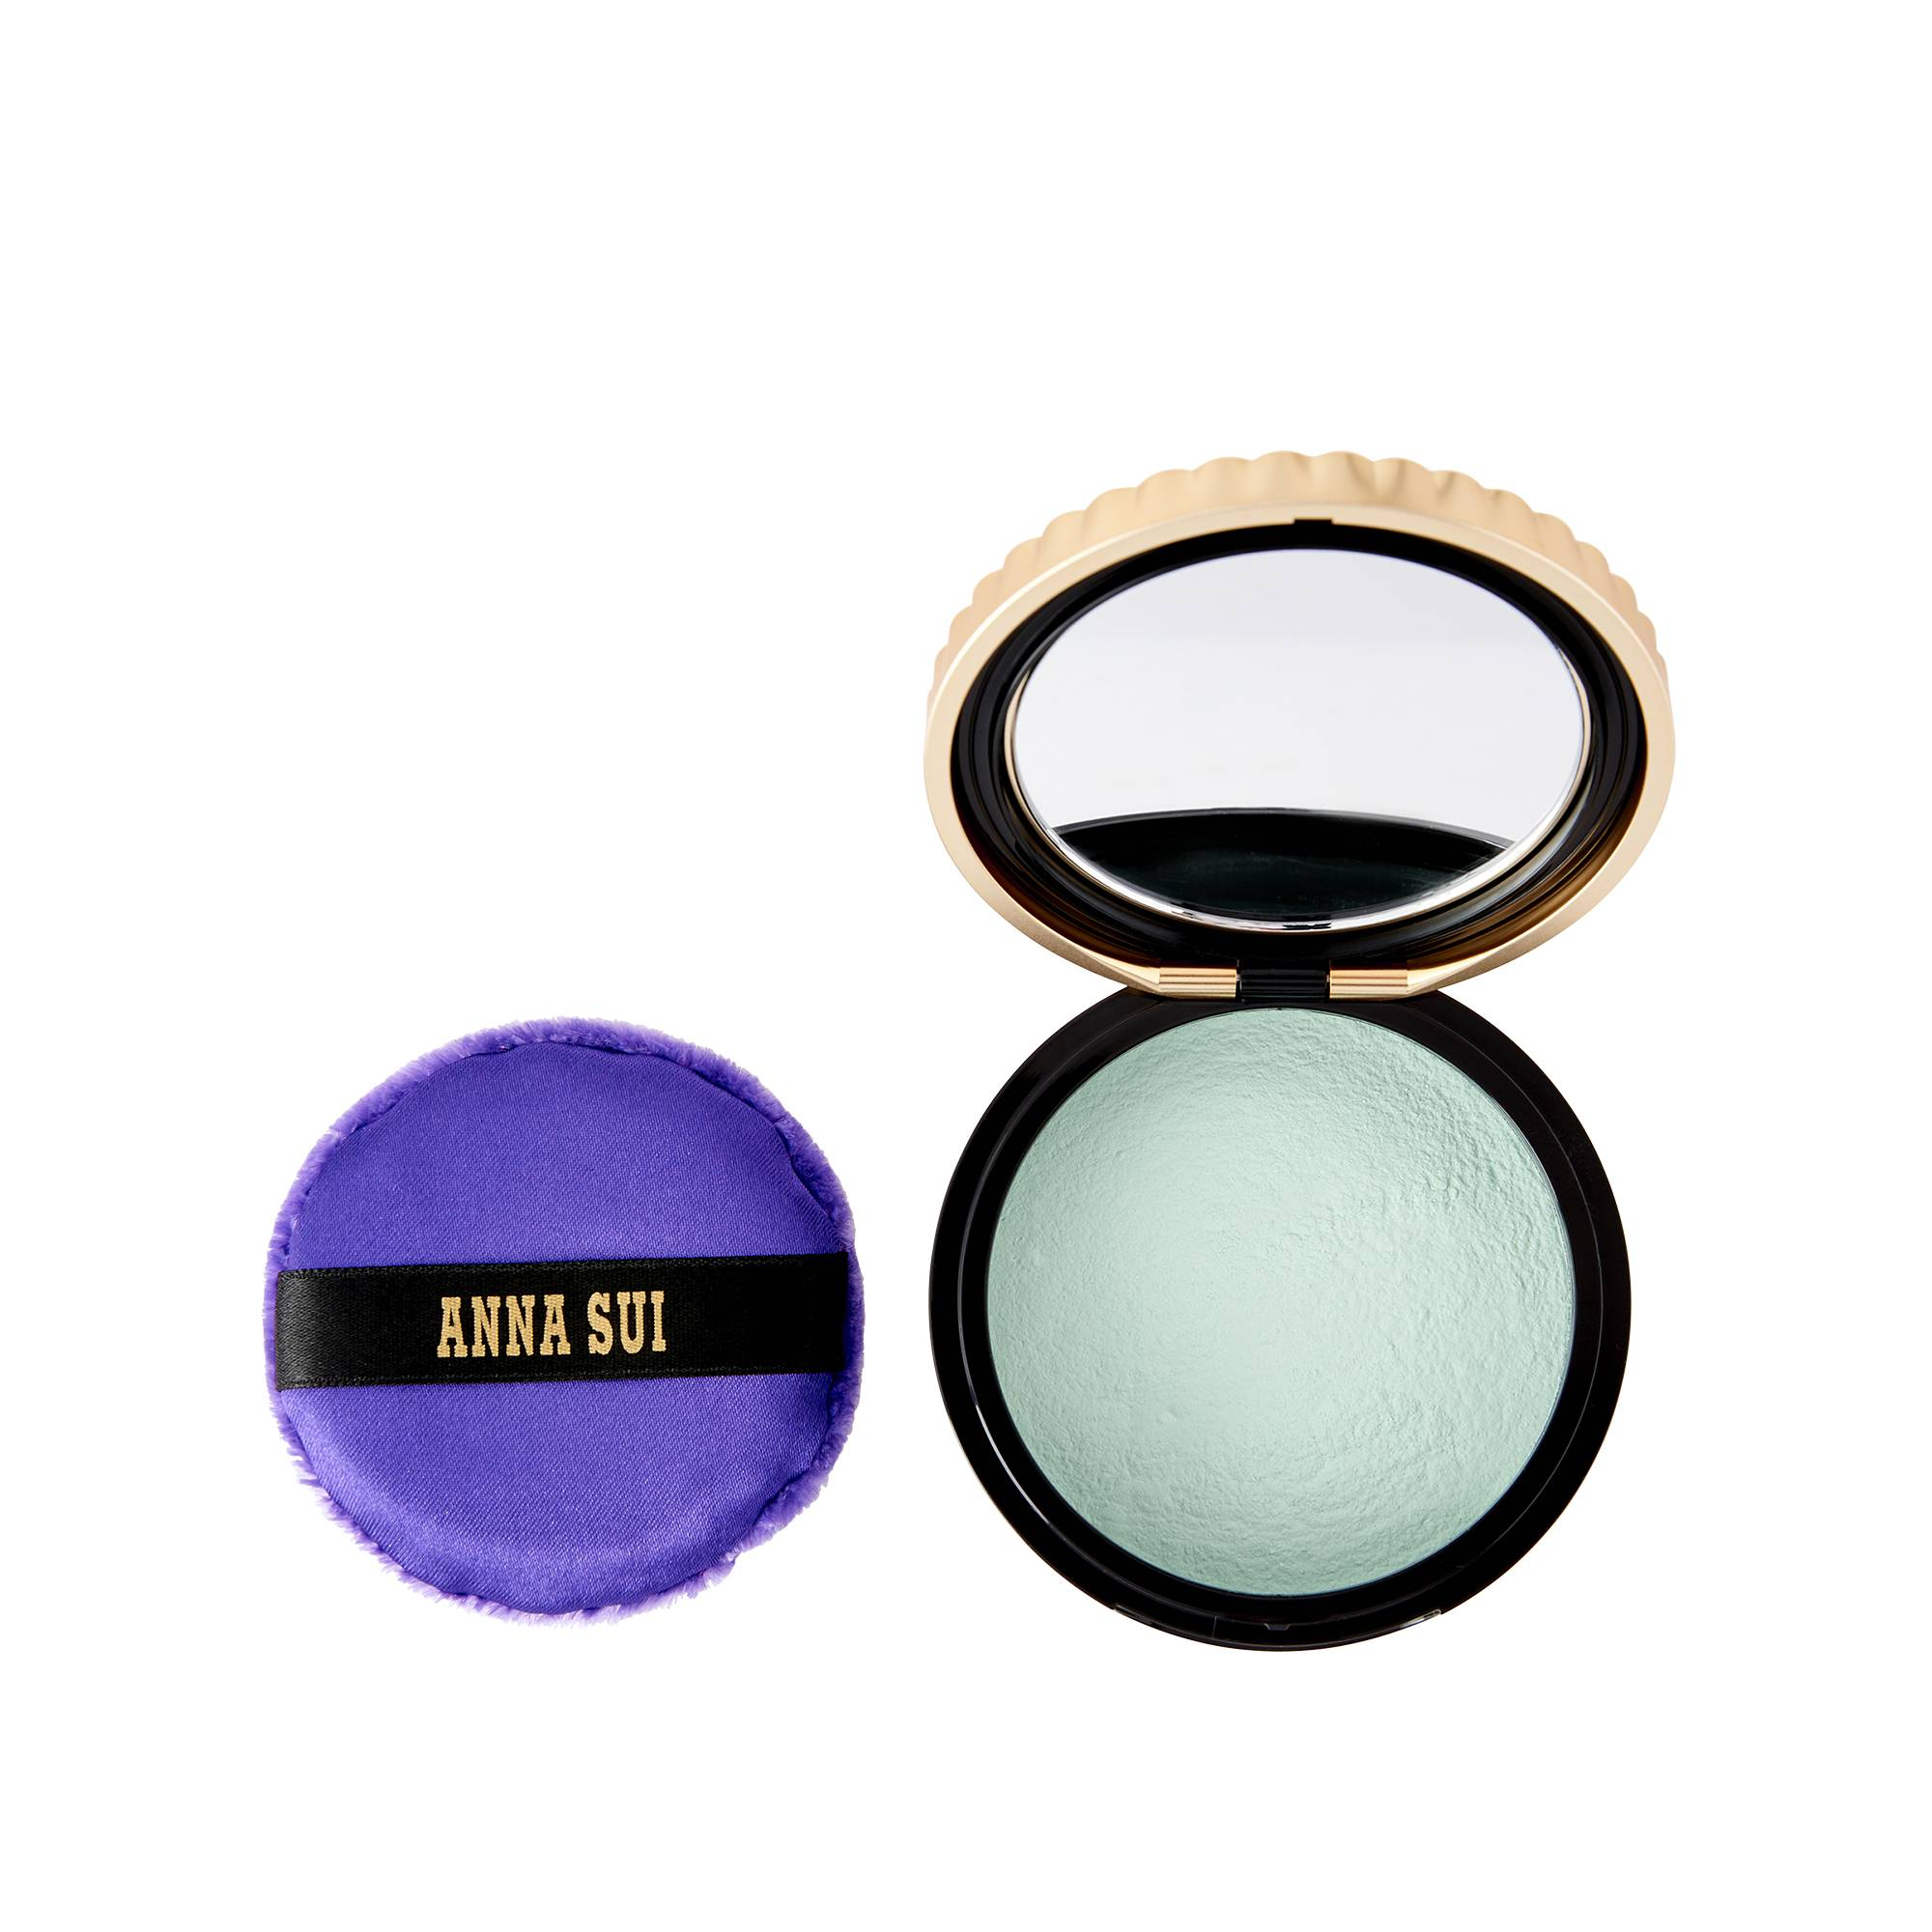 Anna Sui Loose Powder M900 Light Green 6g